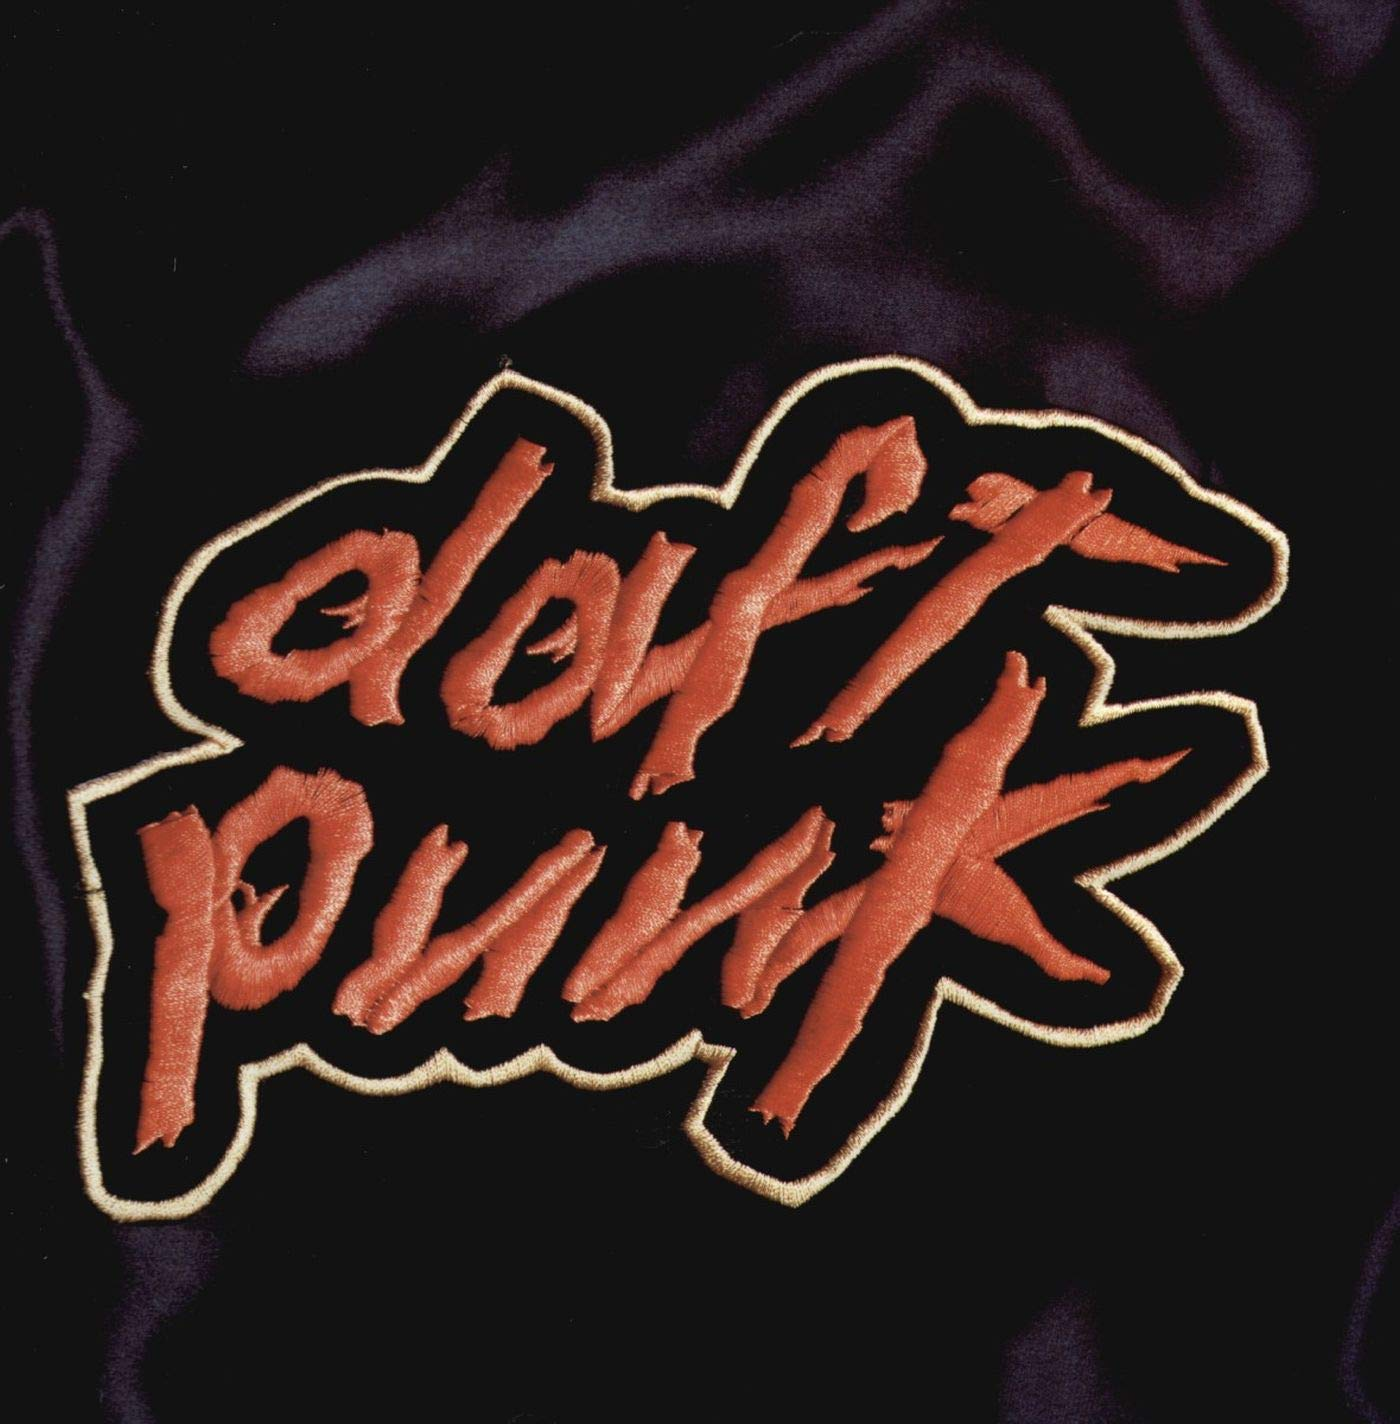 Daft Punk - Homework Vinyl